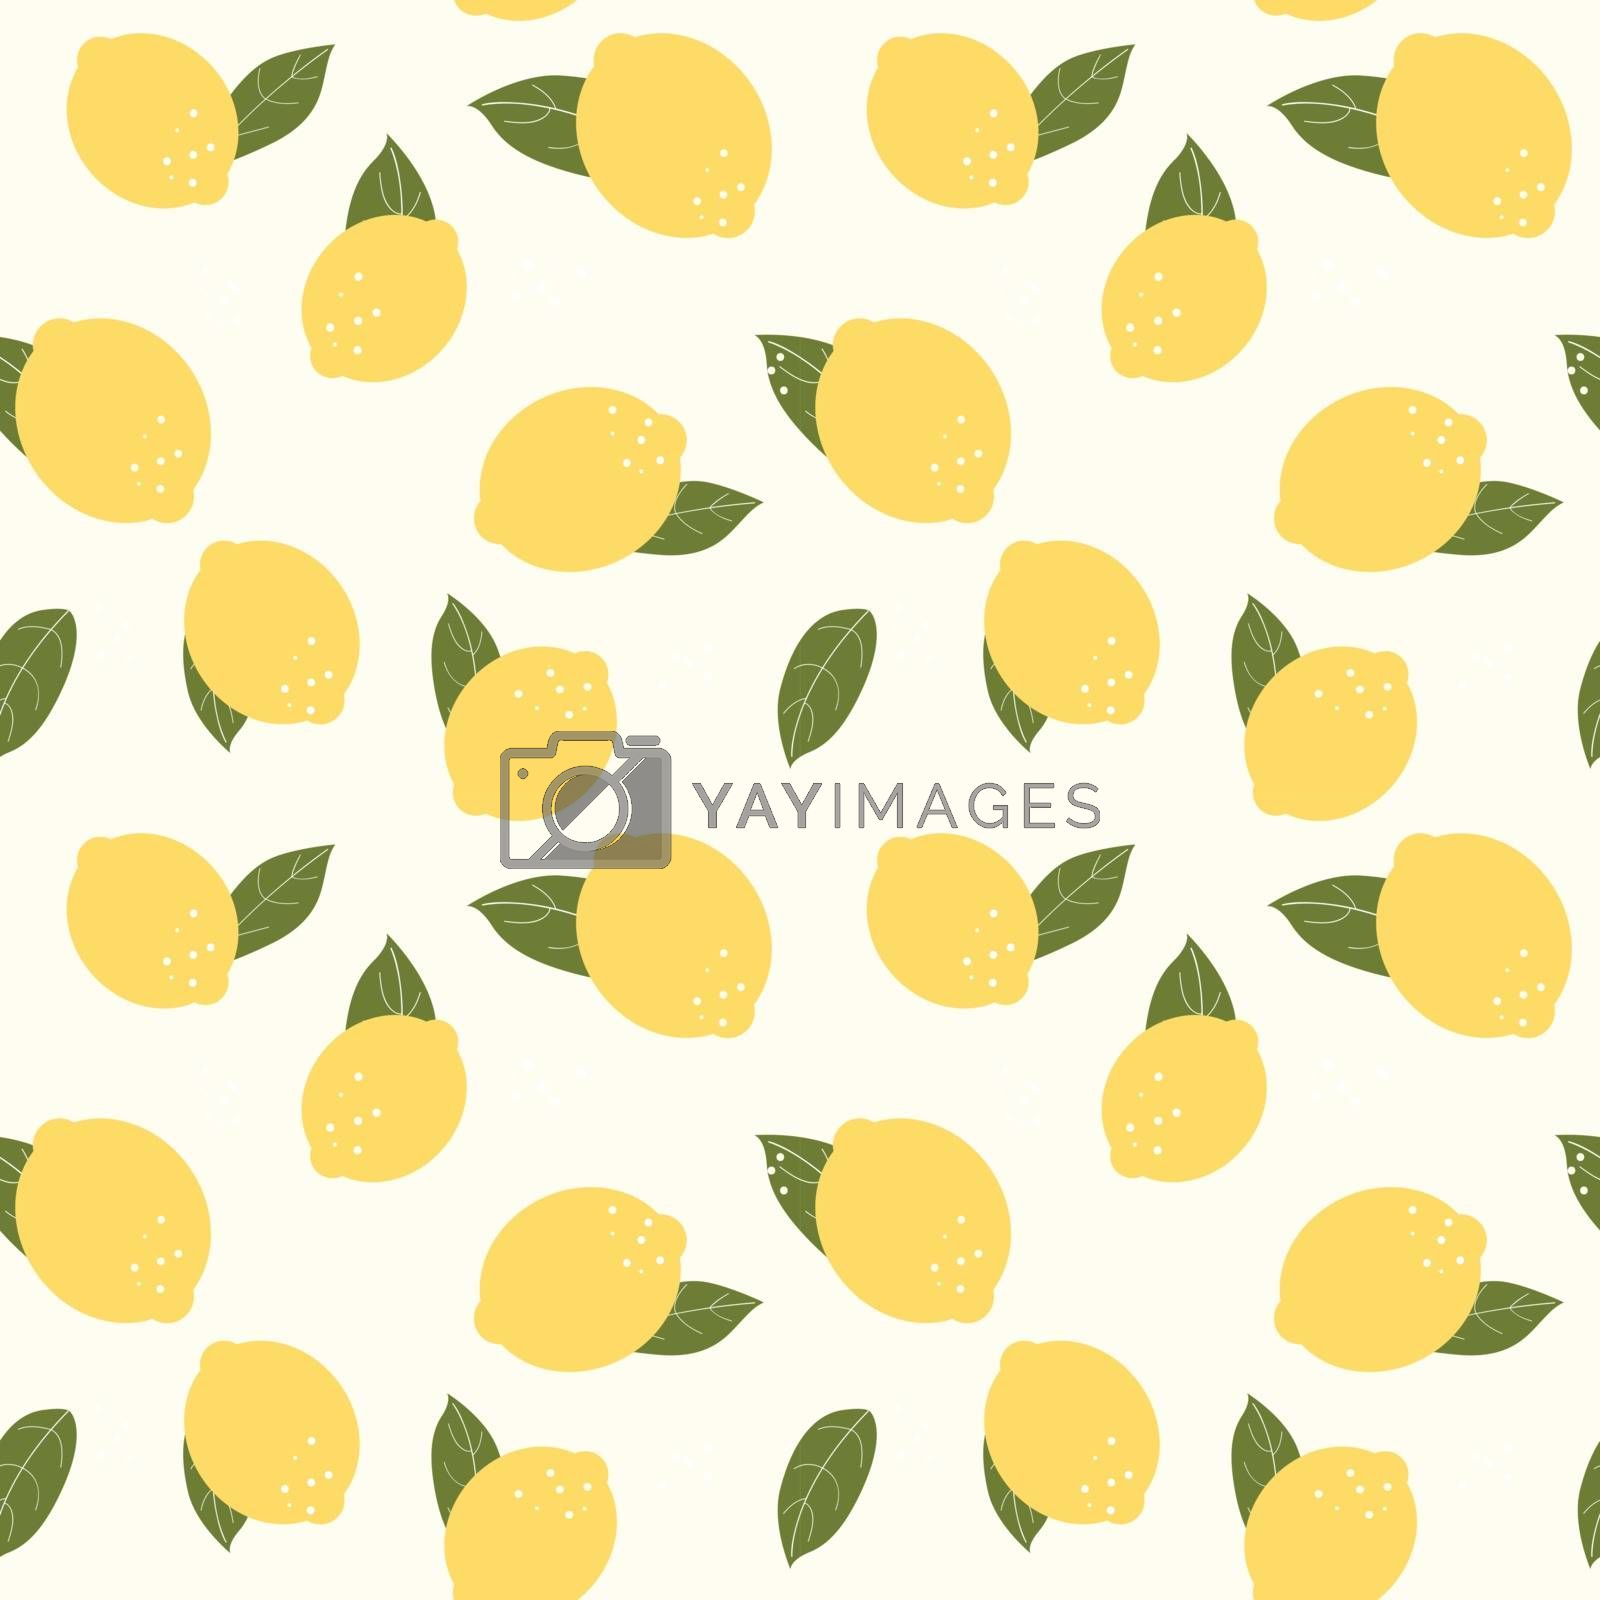 Abstract Lemon Seamless Pattern Background Vector Illustration EPS10